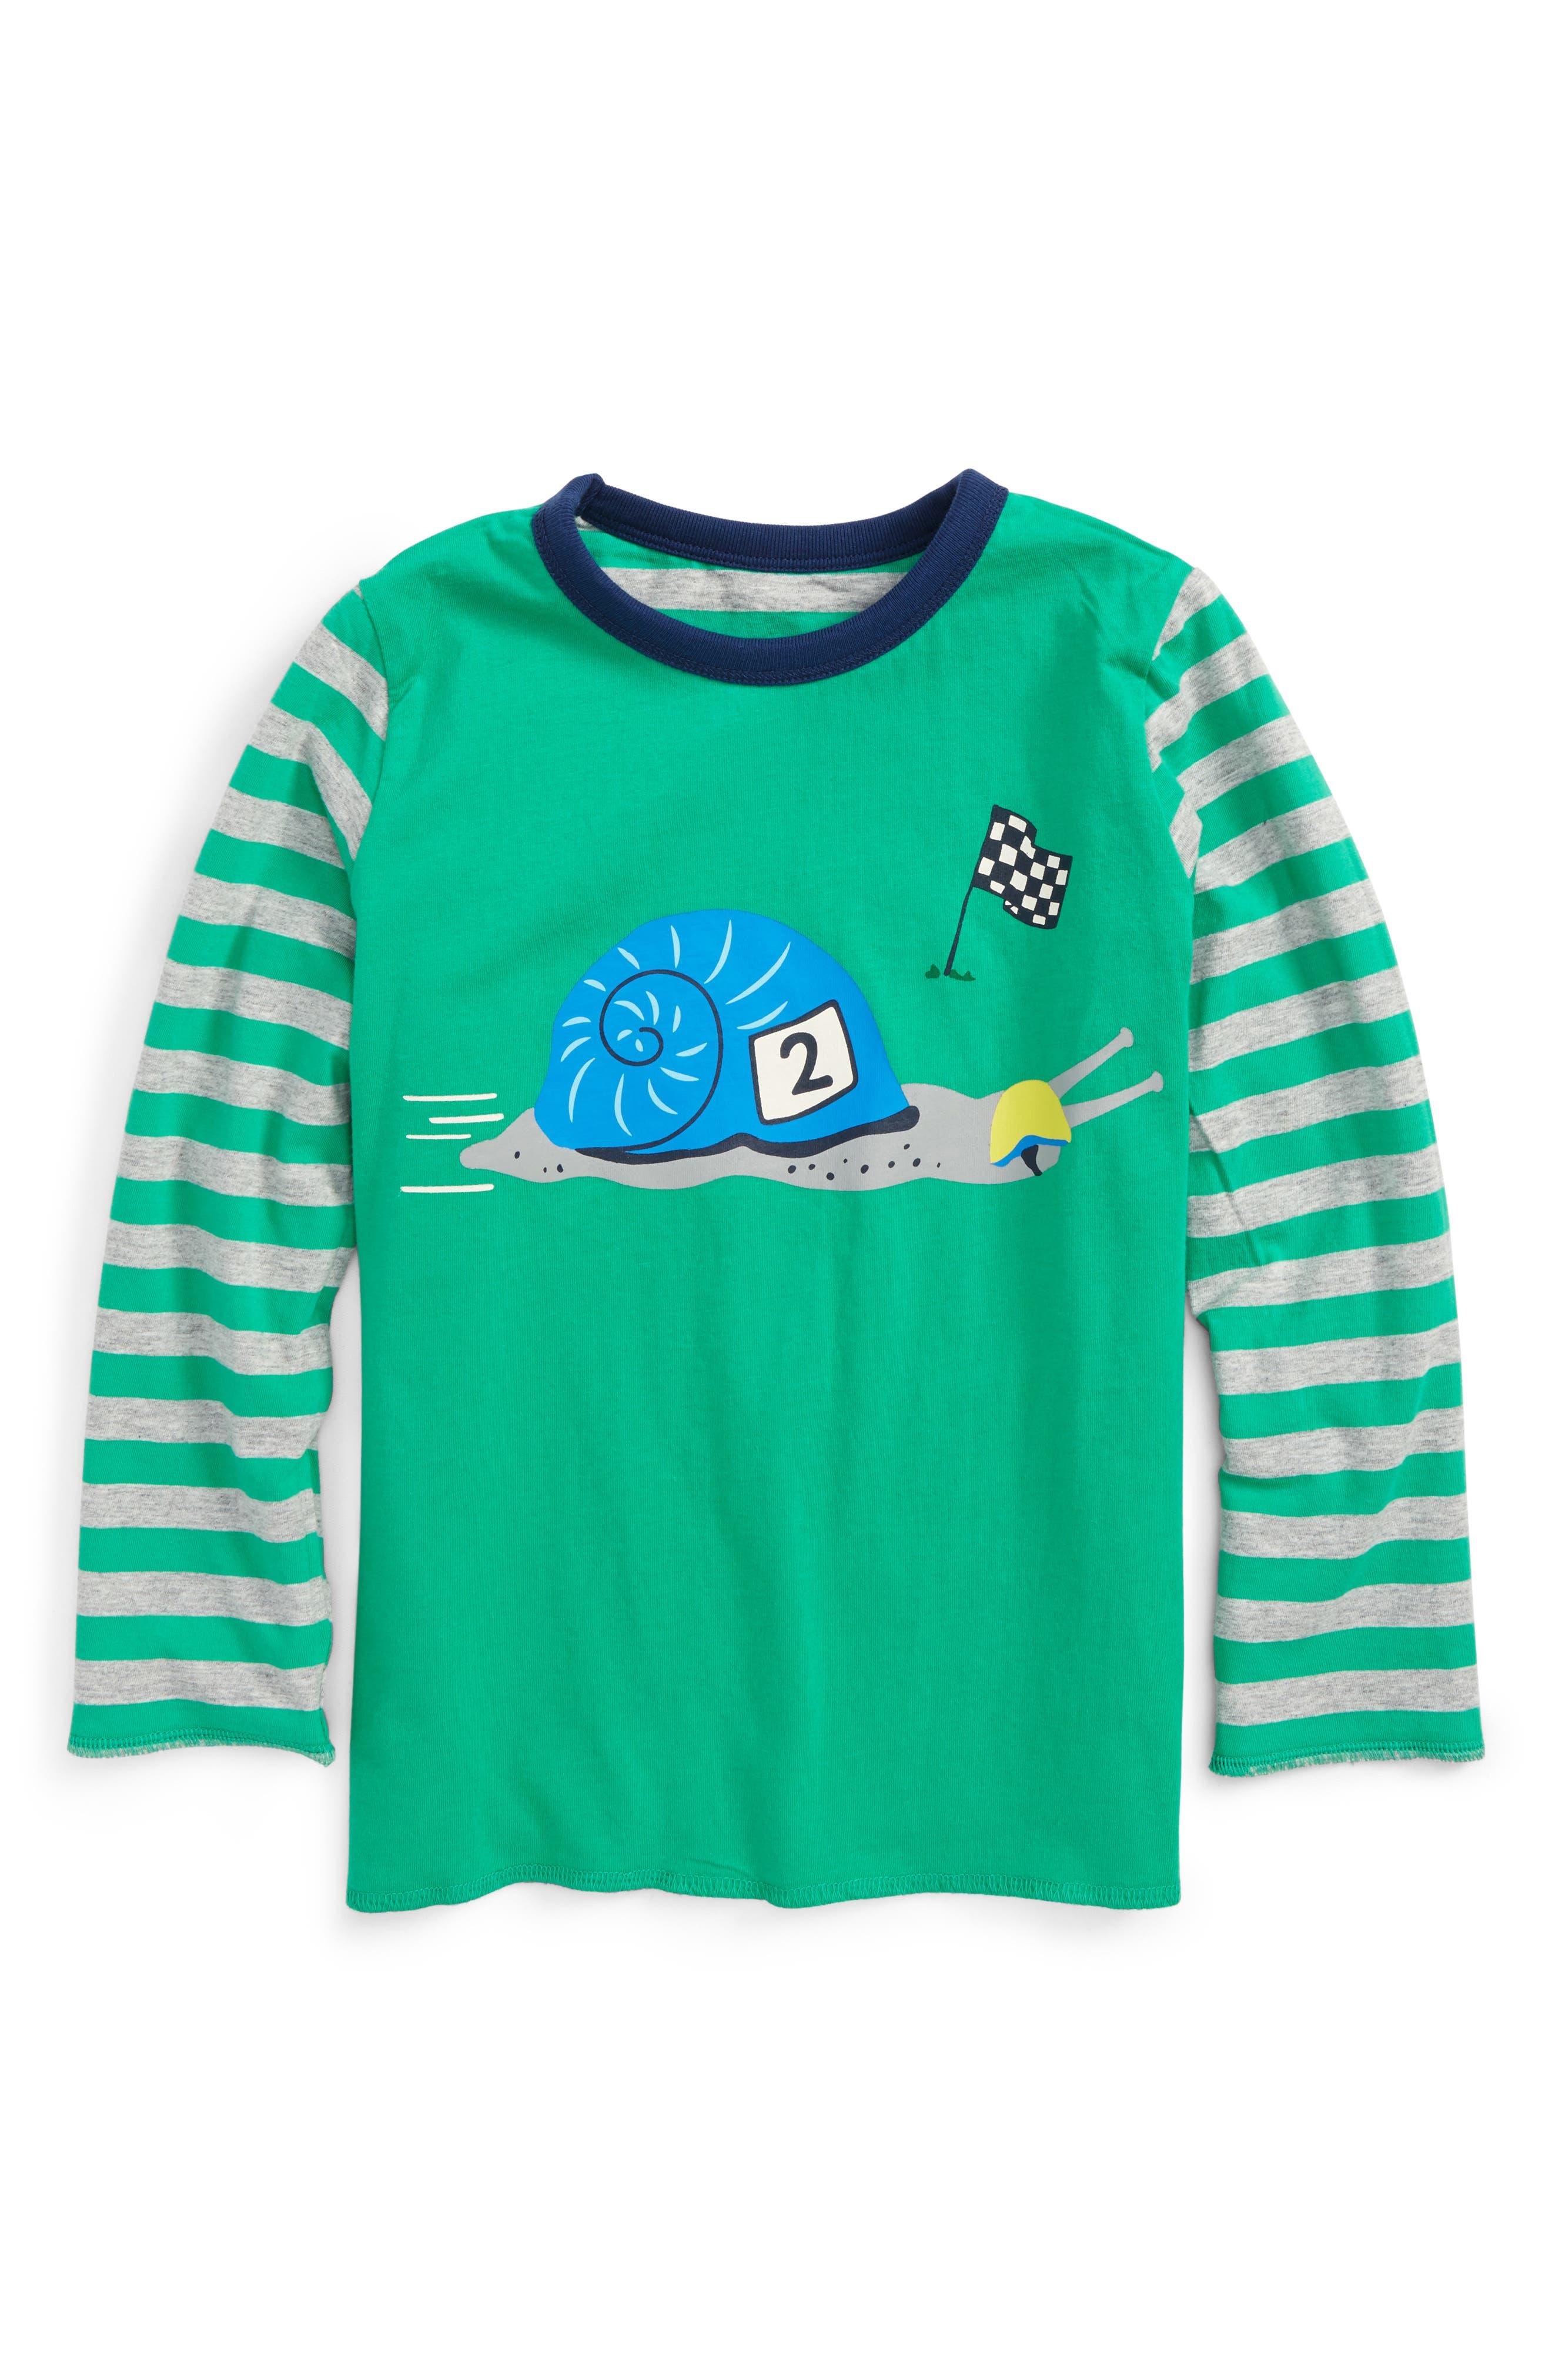 Main Image - Mini Boden Animal Reversible T-Shirt (Toddler Boys, Little Boys & Big Boys)